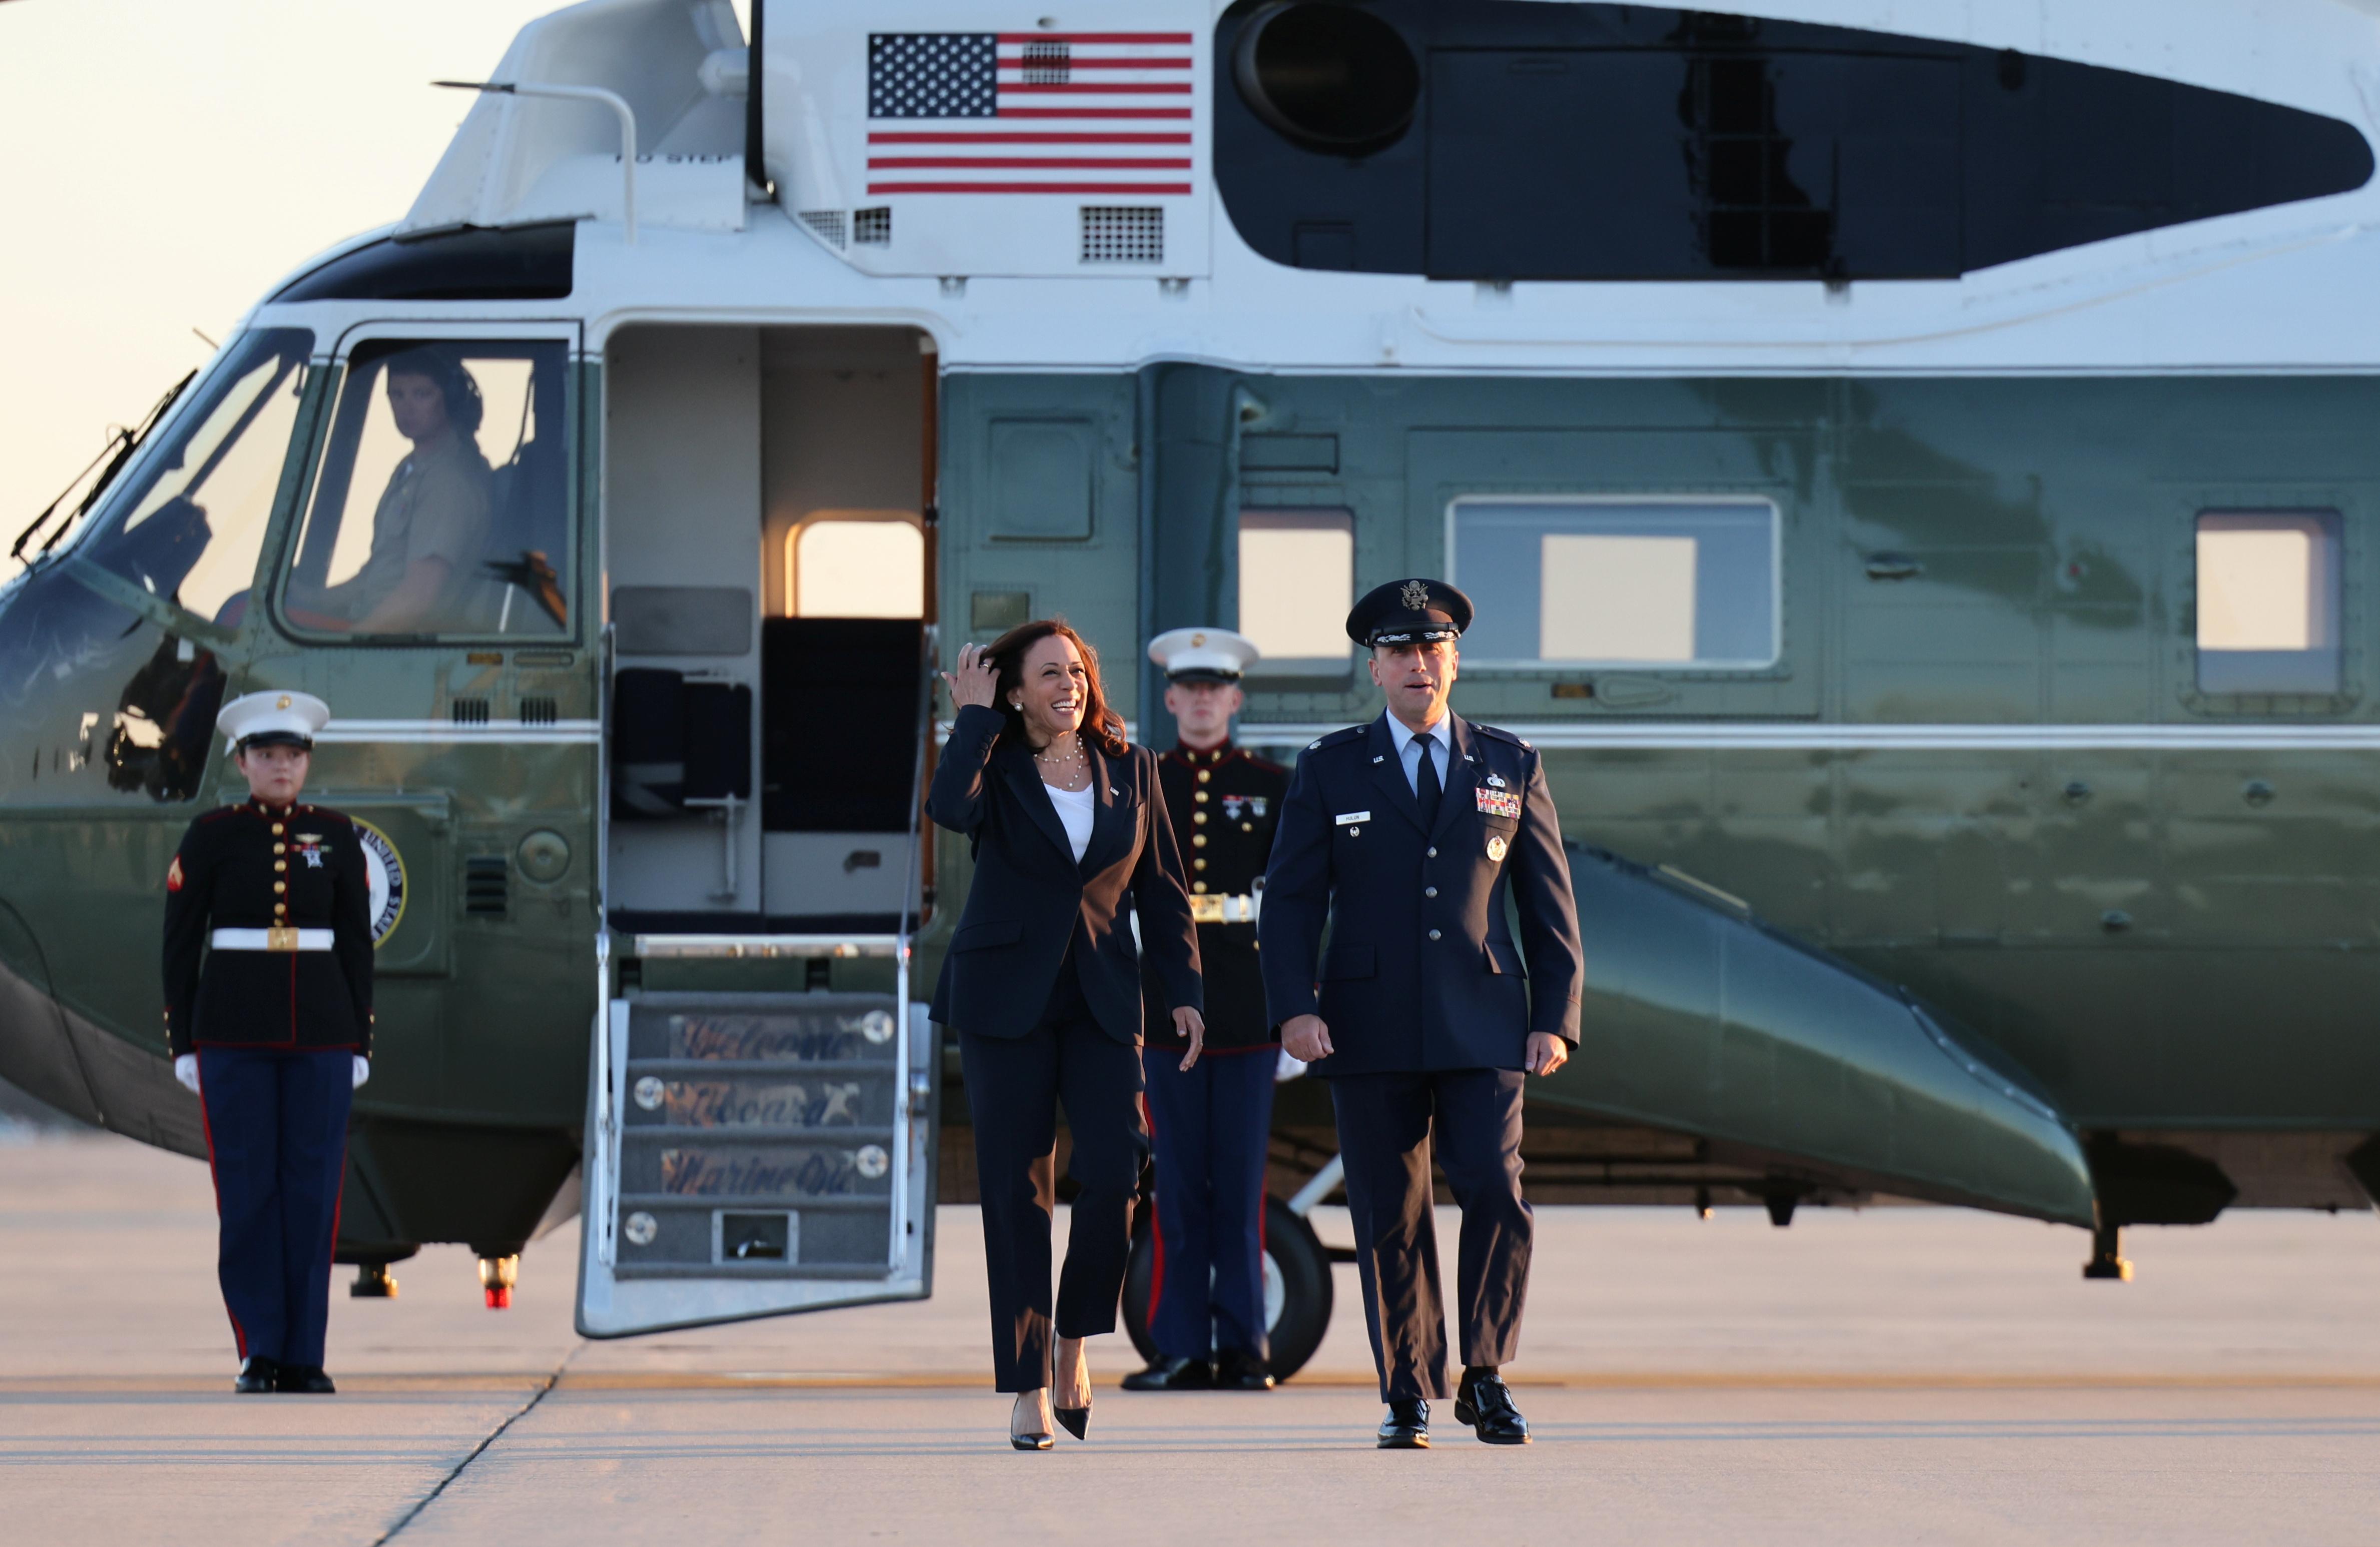 U.S. Vice President Kamala Harris walks with Lt. Col Richard